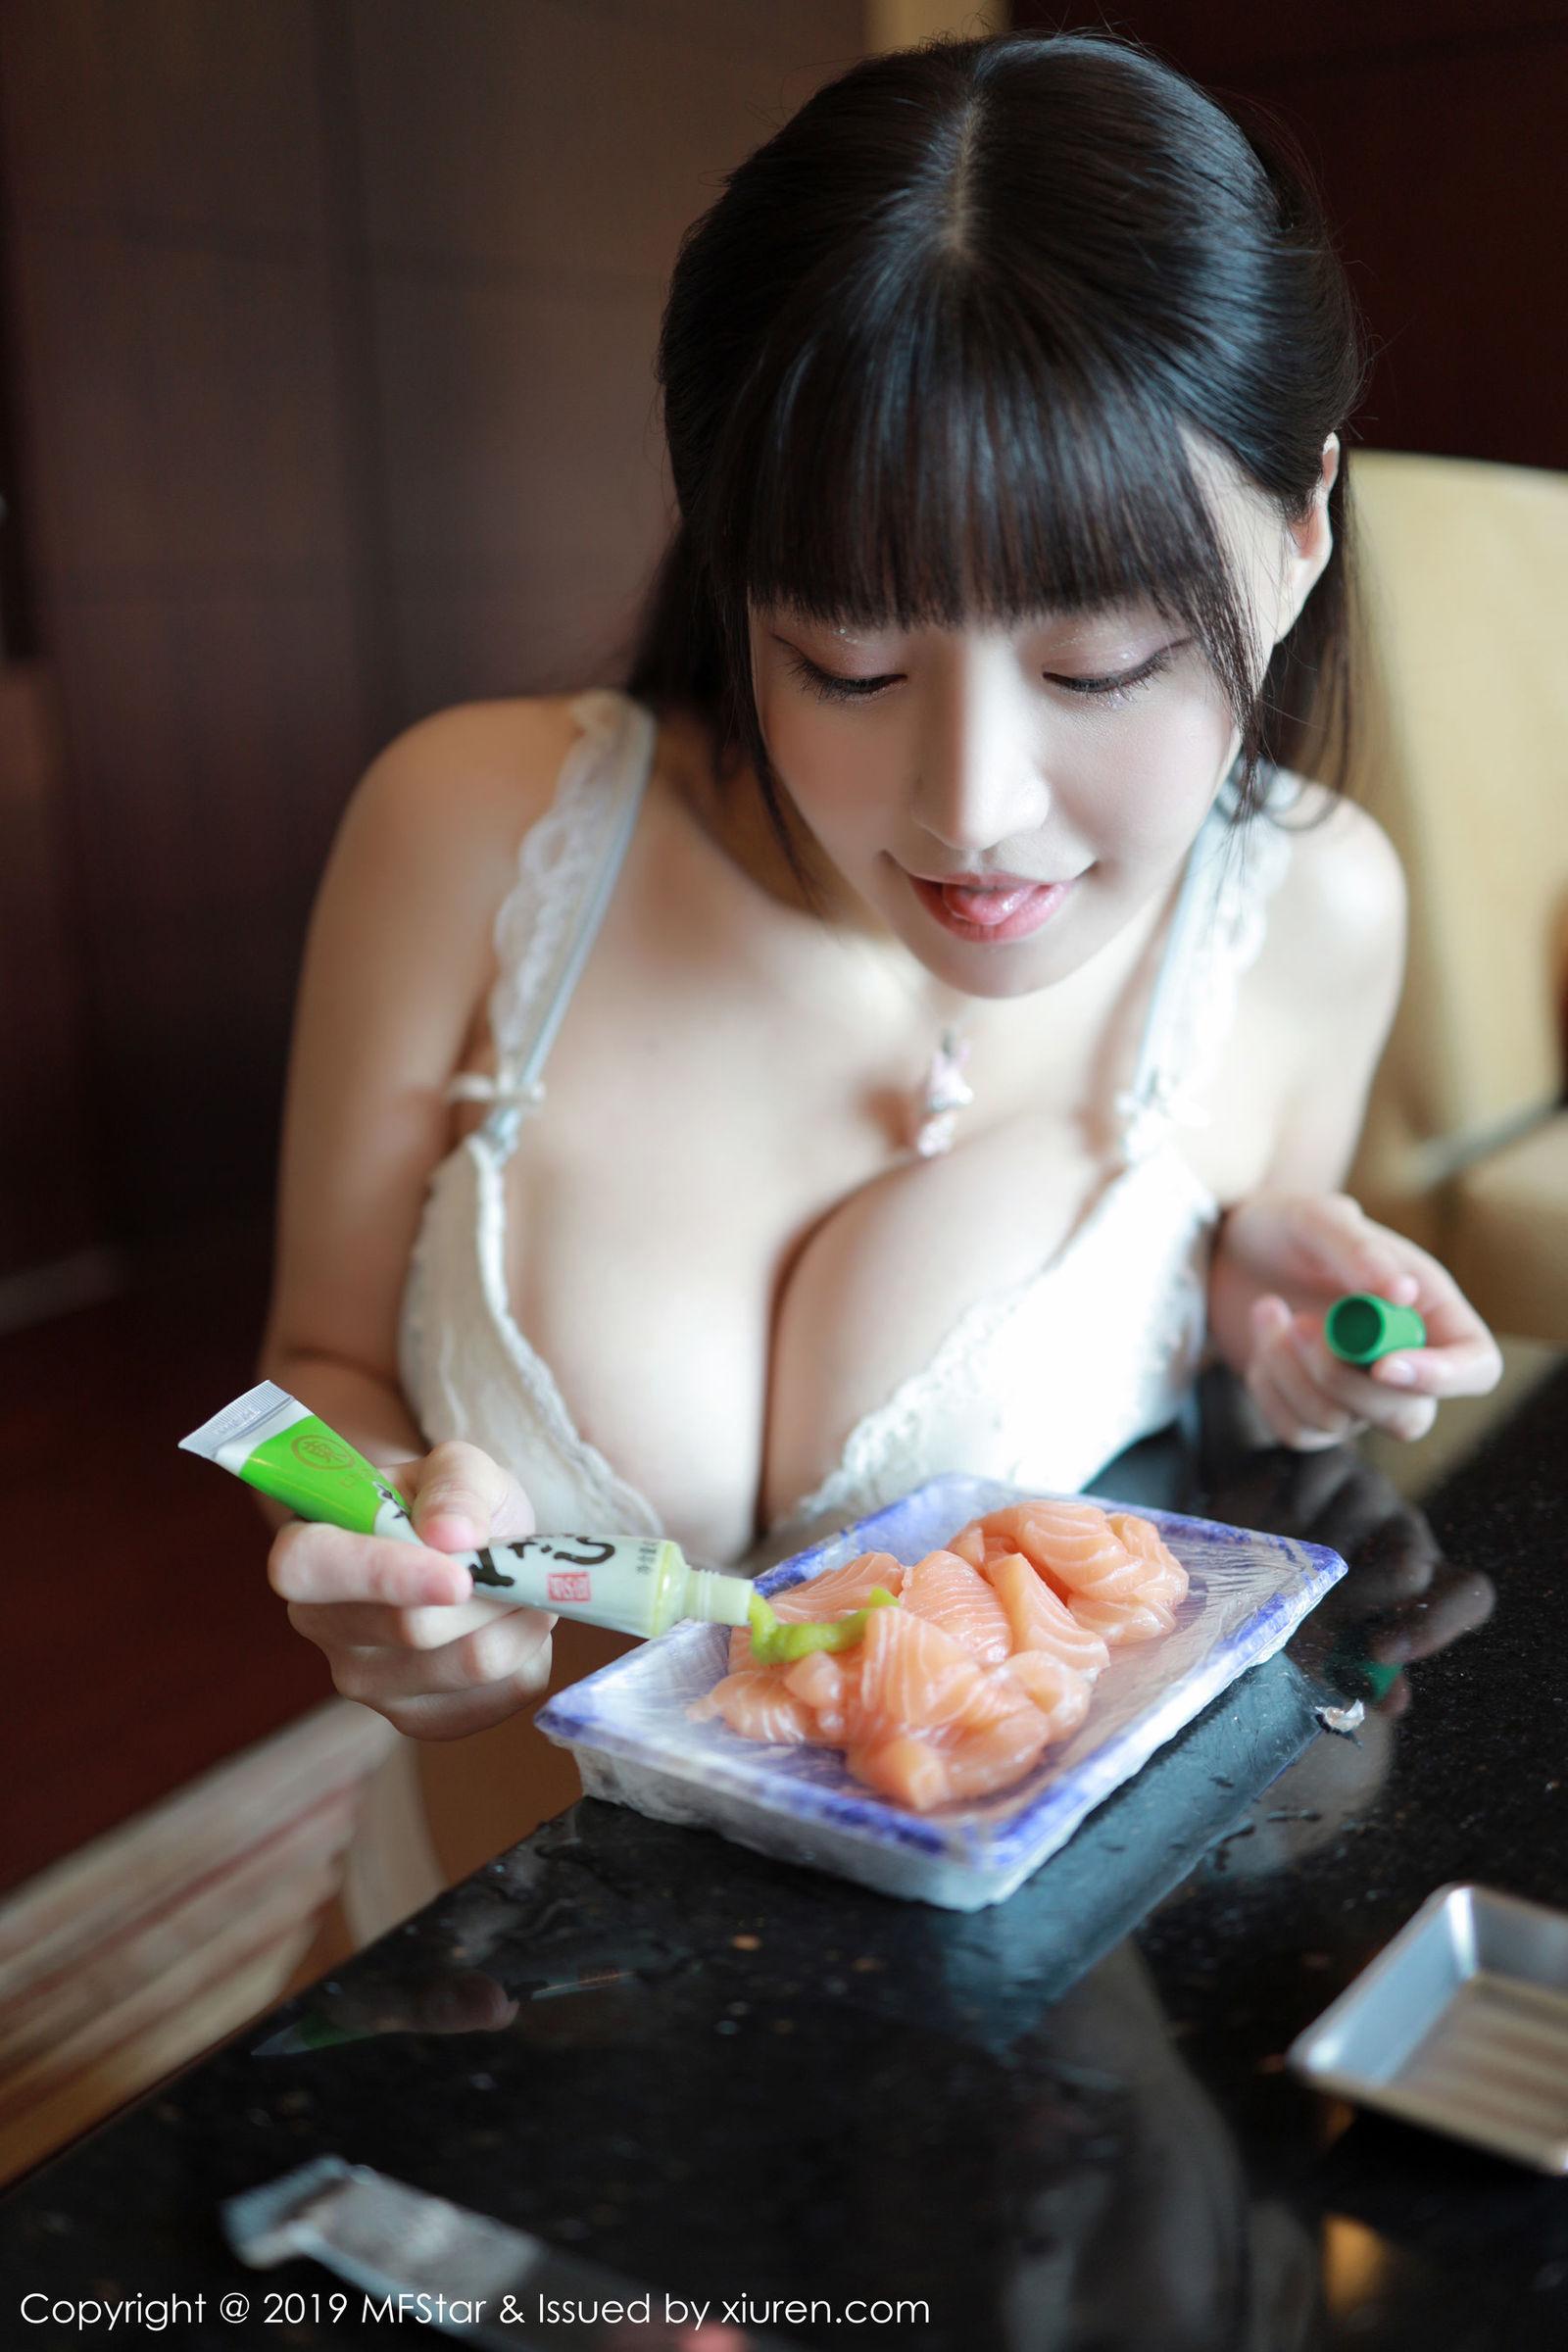 [MFStar模范学院] Vol.209 Flower朱可儿 - 秀色可餐的三文鱼人体盛宴[43P]